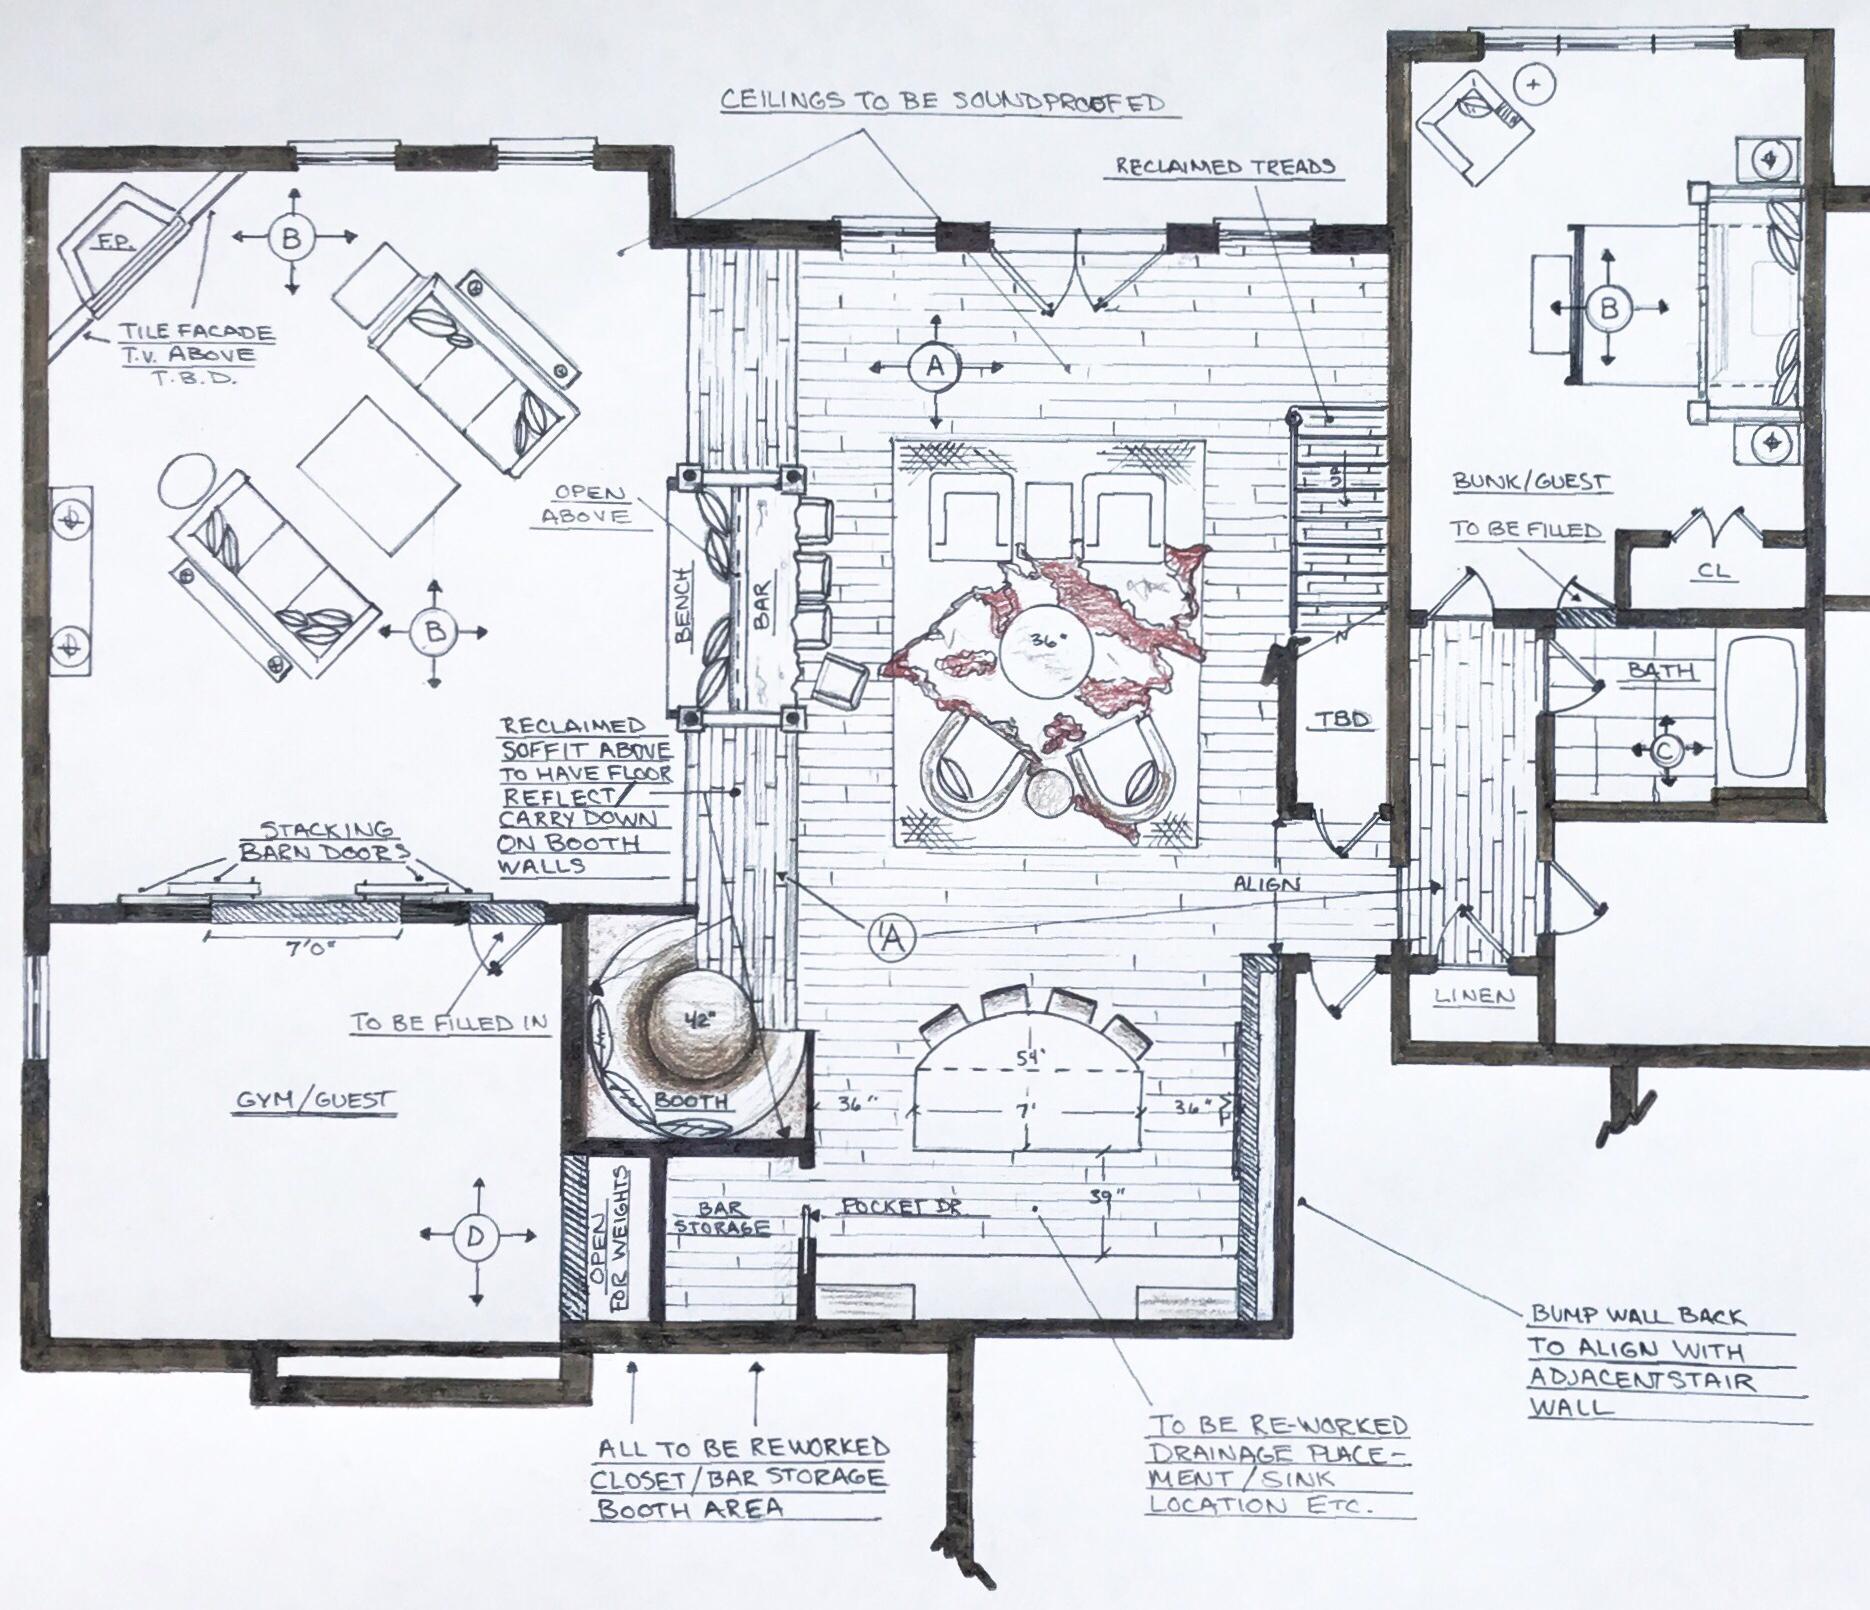 Initial Design Proposal